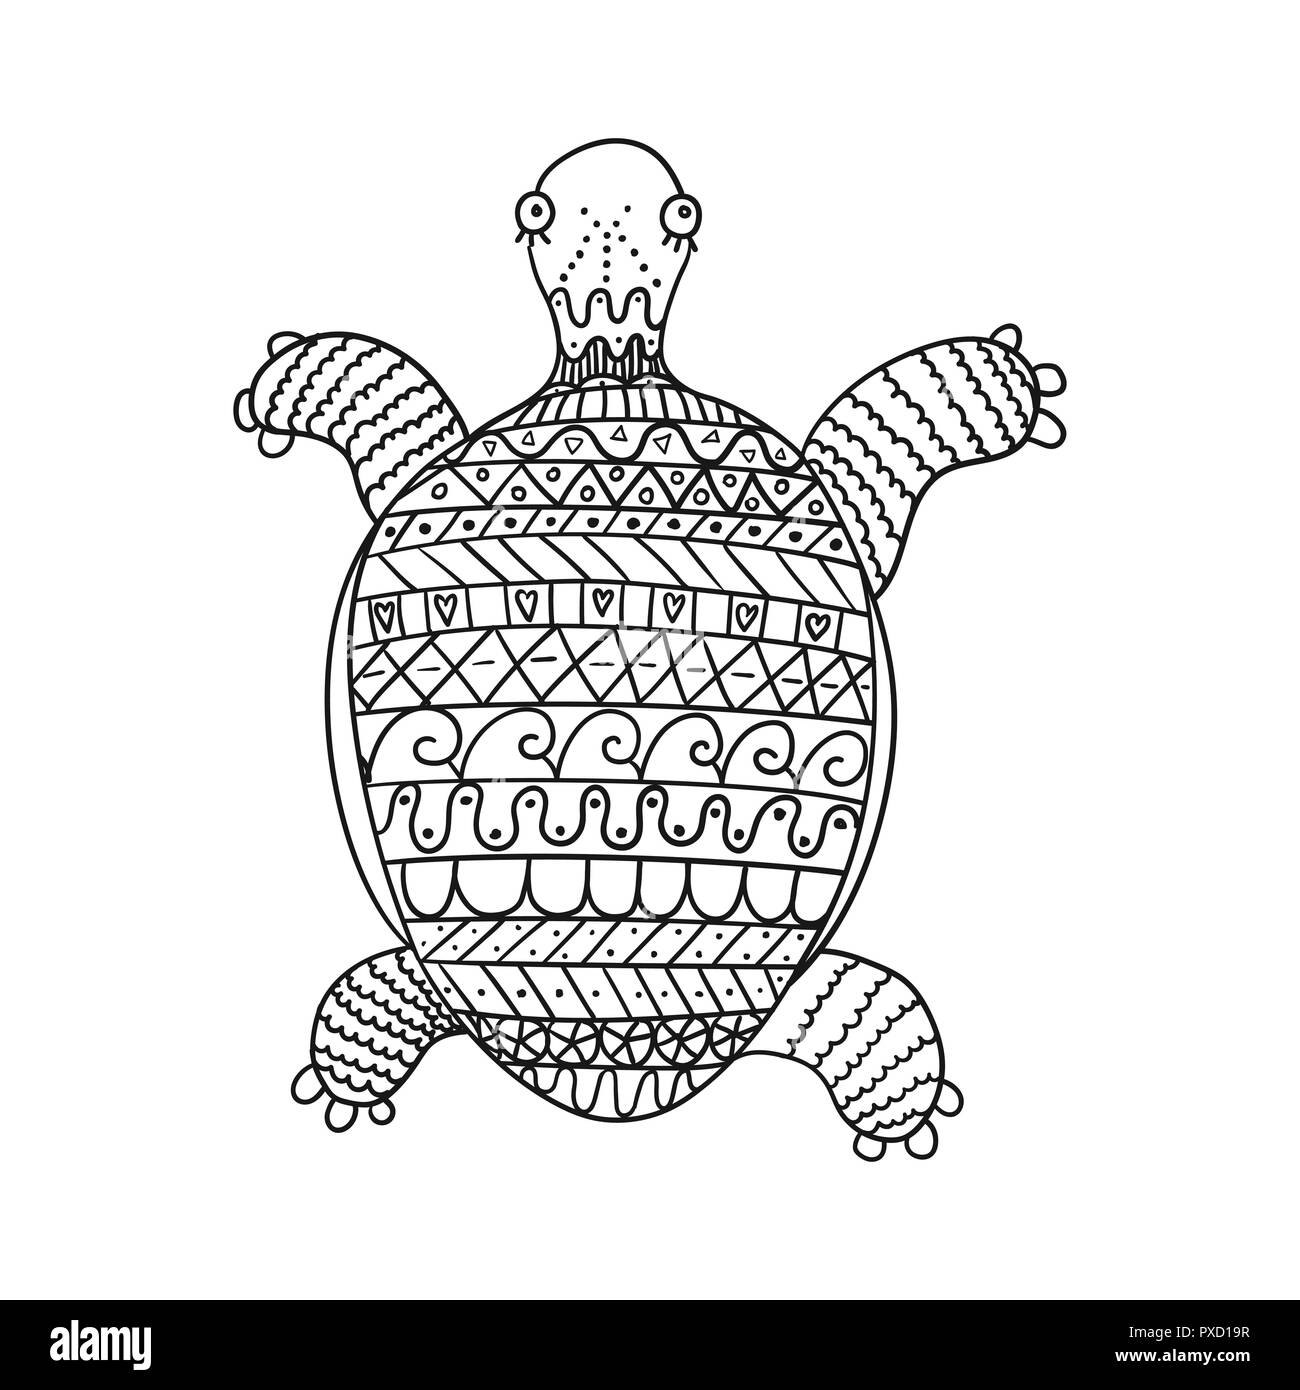 Stylized turtle isolated on white background. Freehand ornamental ...